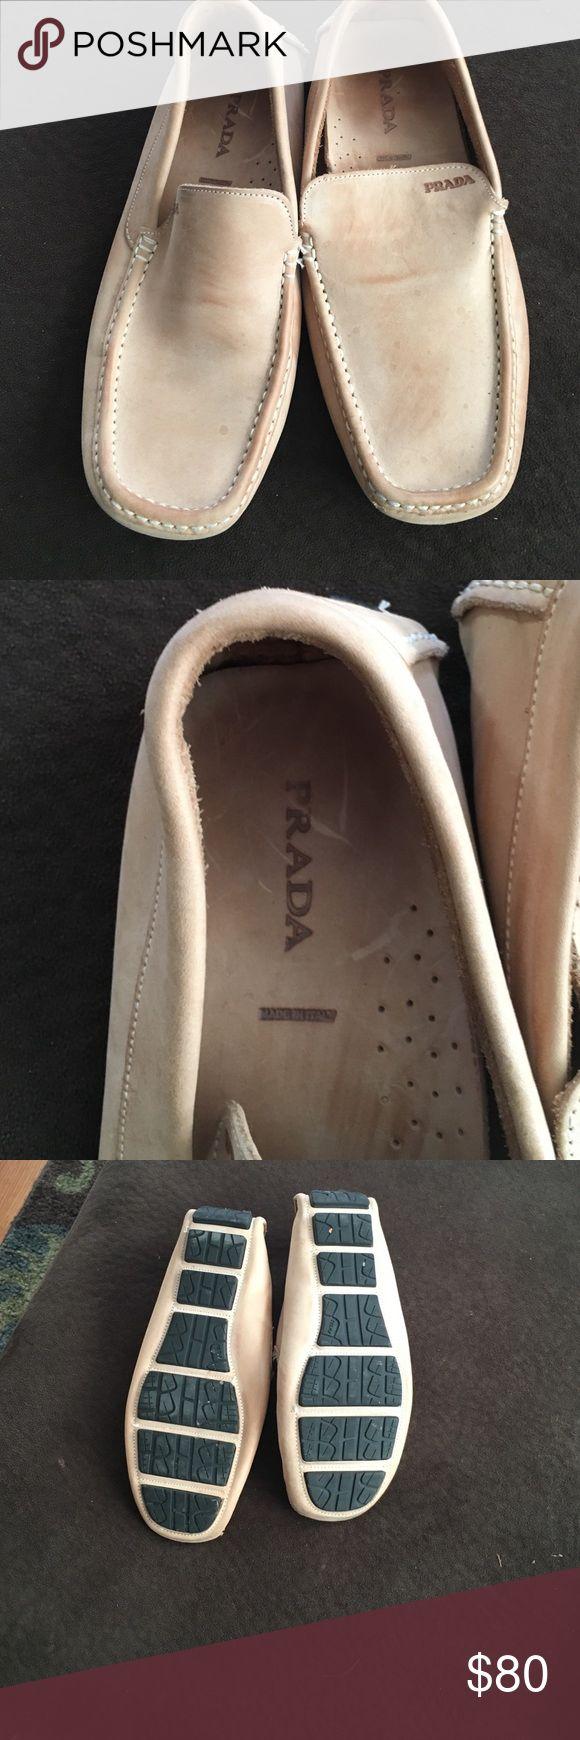 Practically brand-new men's Prada shoe Practically brand-new men's Prada shoe Prada Shoes